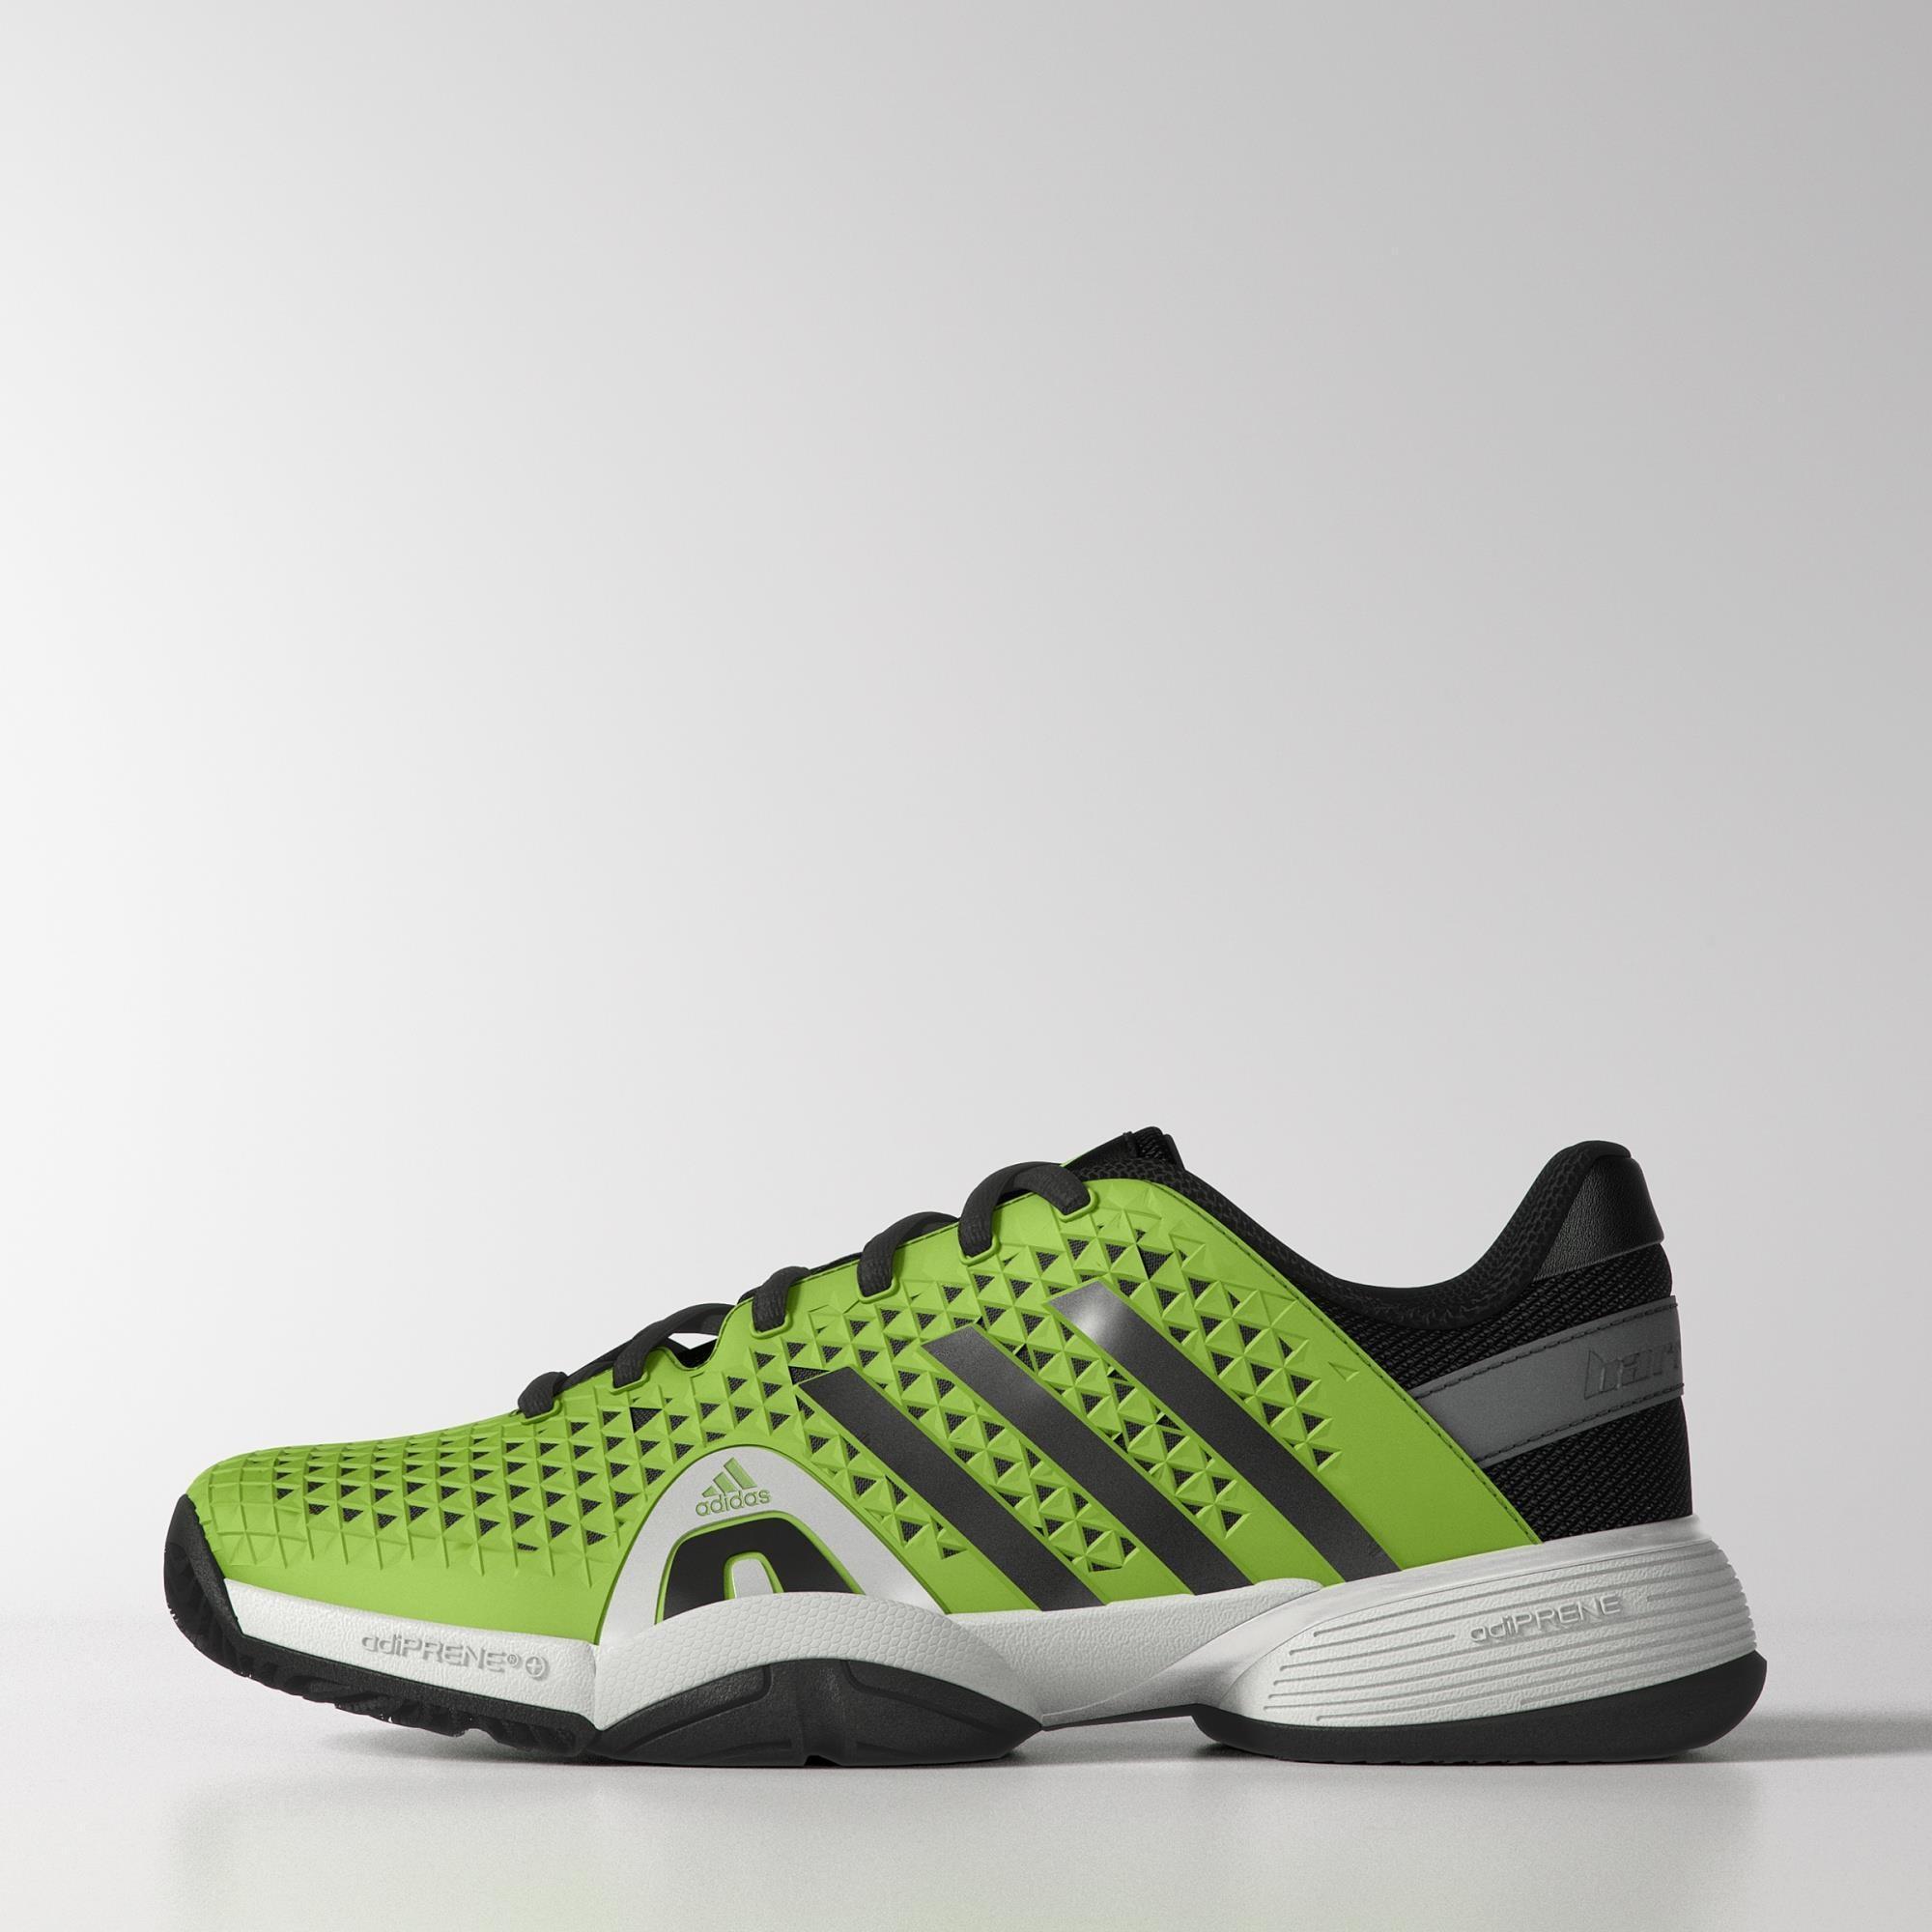 Adidas Kids Barricade 8+ xJ Junior Tennis Shoes - Solar Green -  Tennisnuts.com eeee9d8182f9